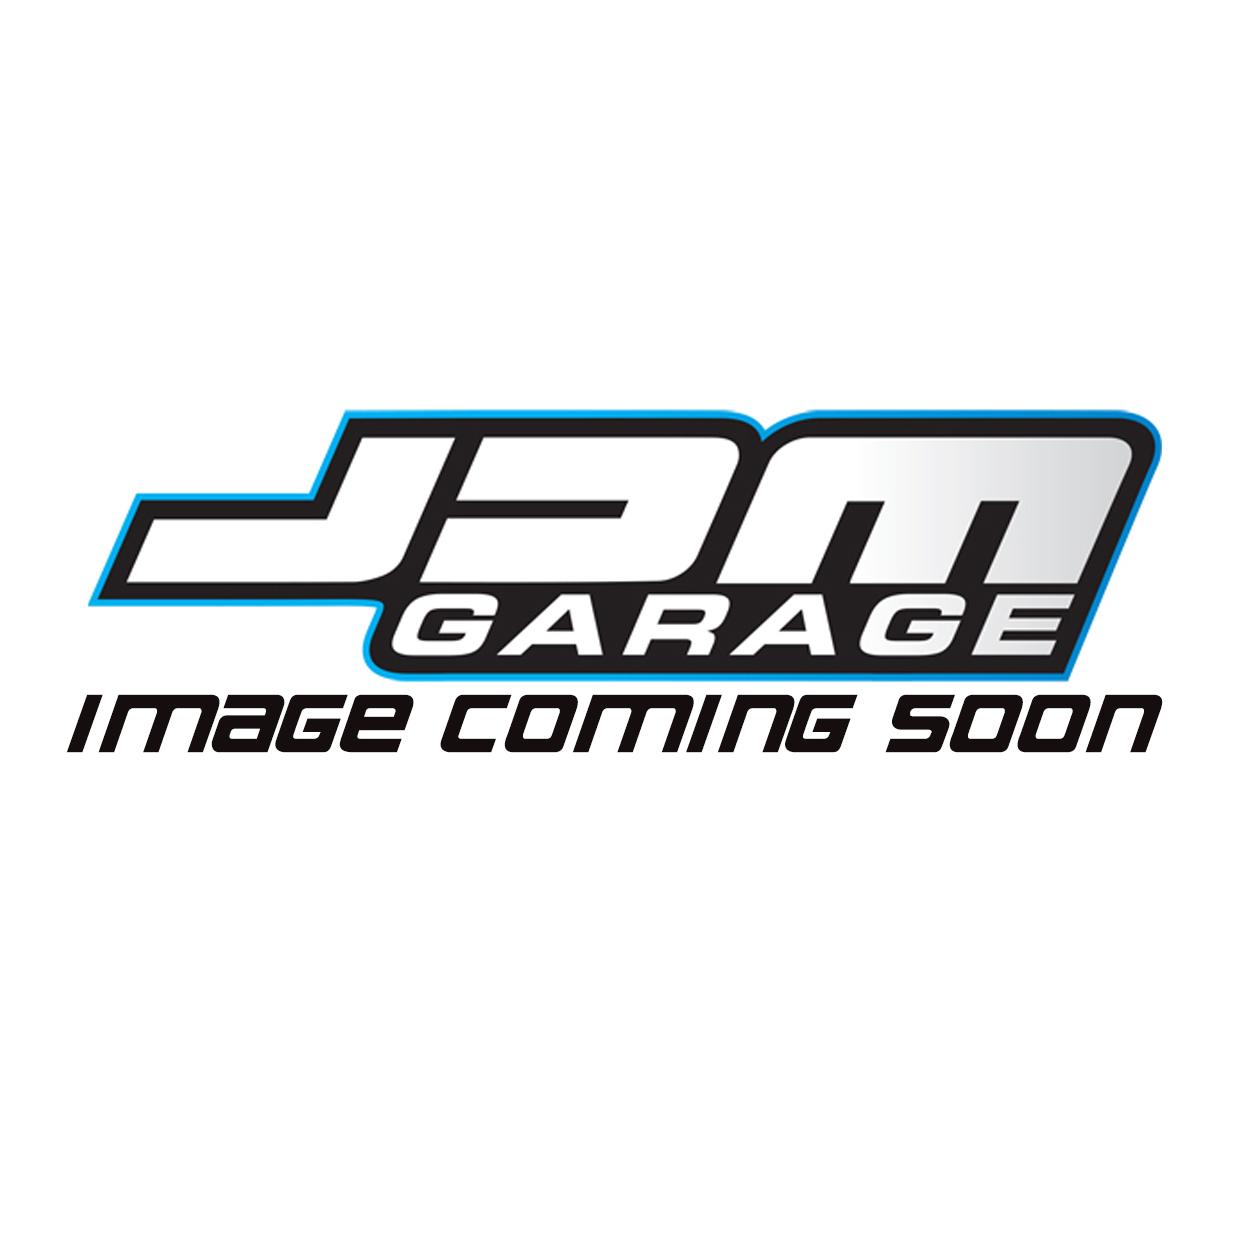 OE Replacement & EBC Greenstuff / Yellowstuff Rear Brake Pads - Mazda MX5 Mk1 NA 90-98